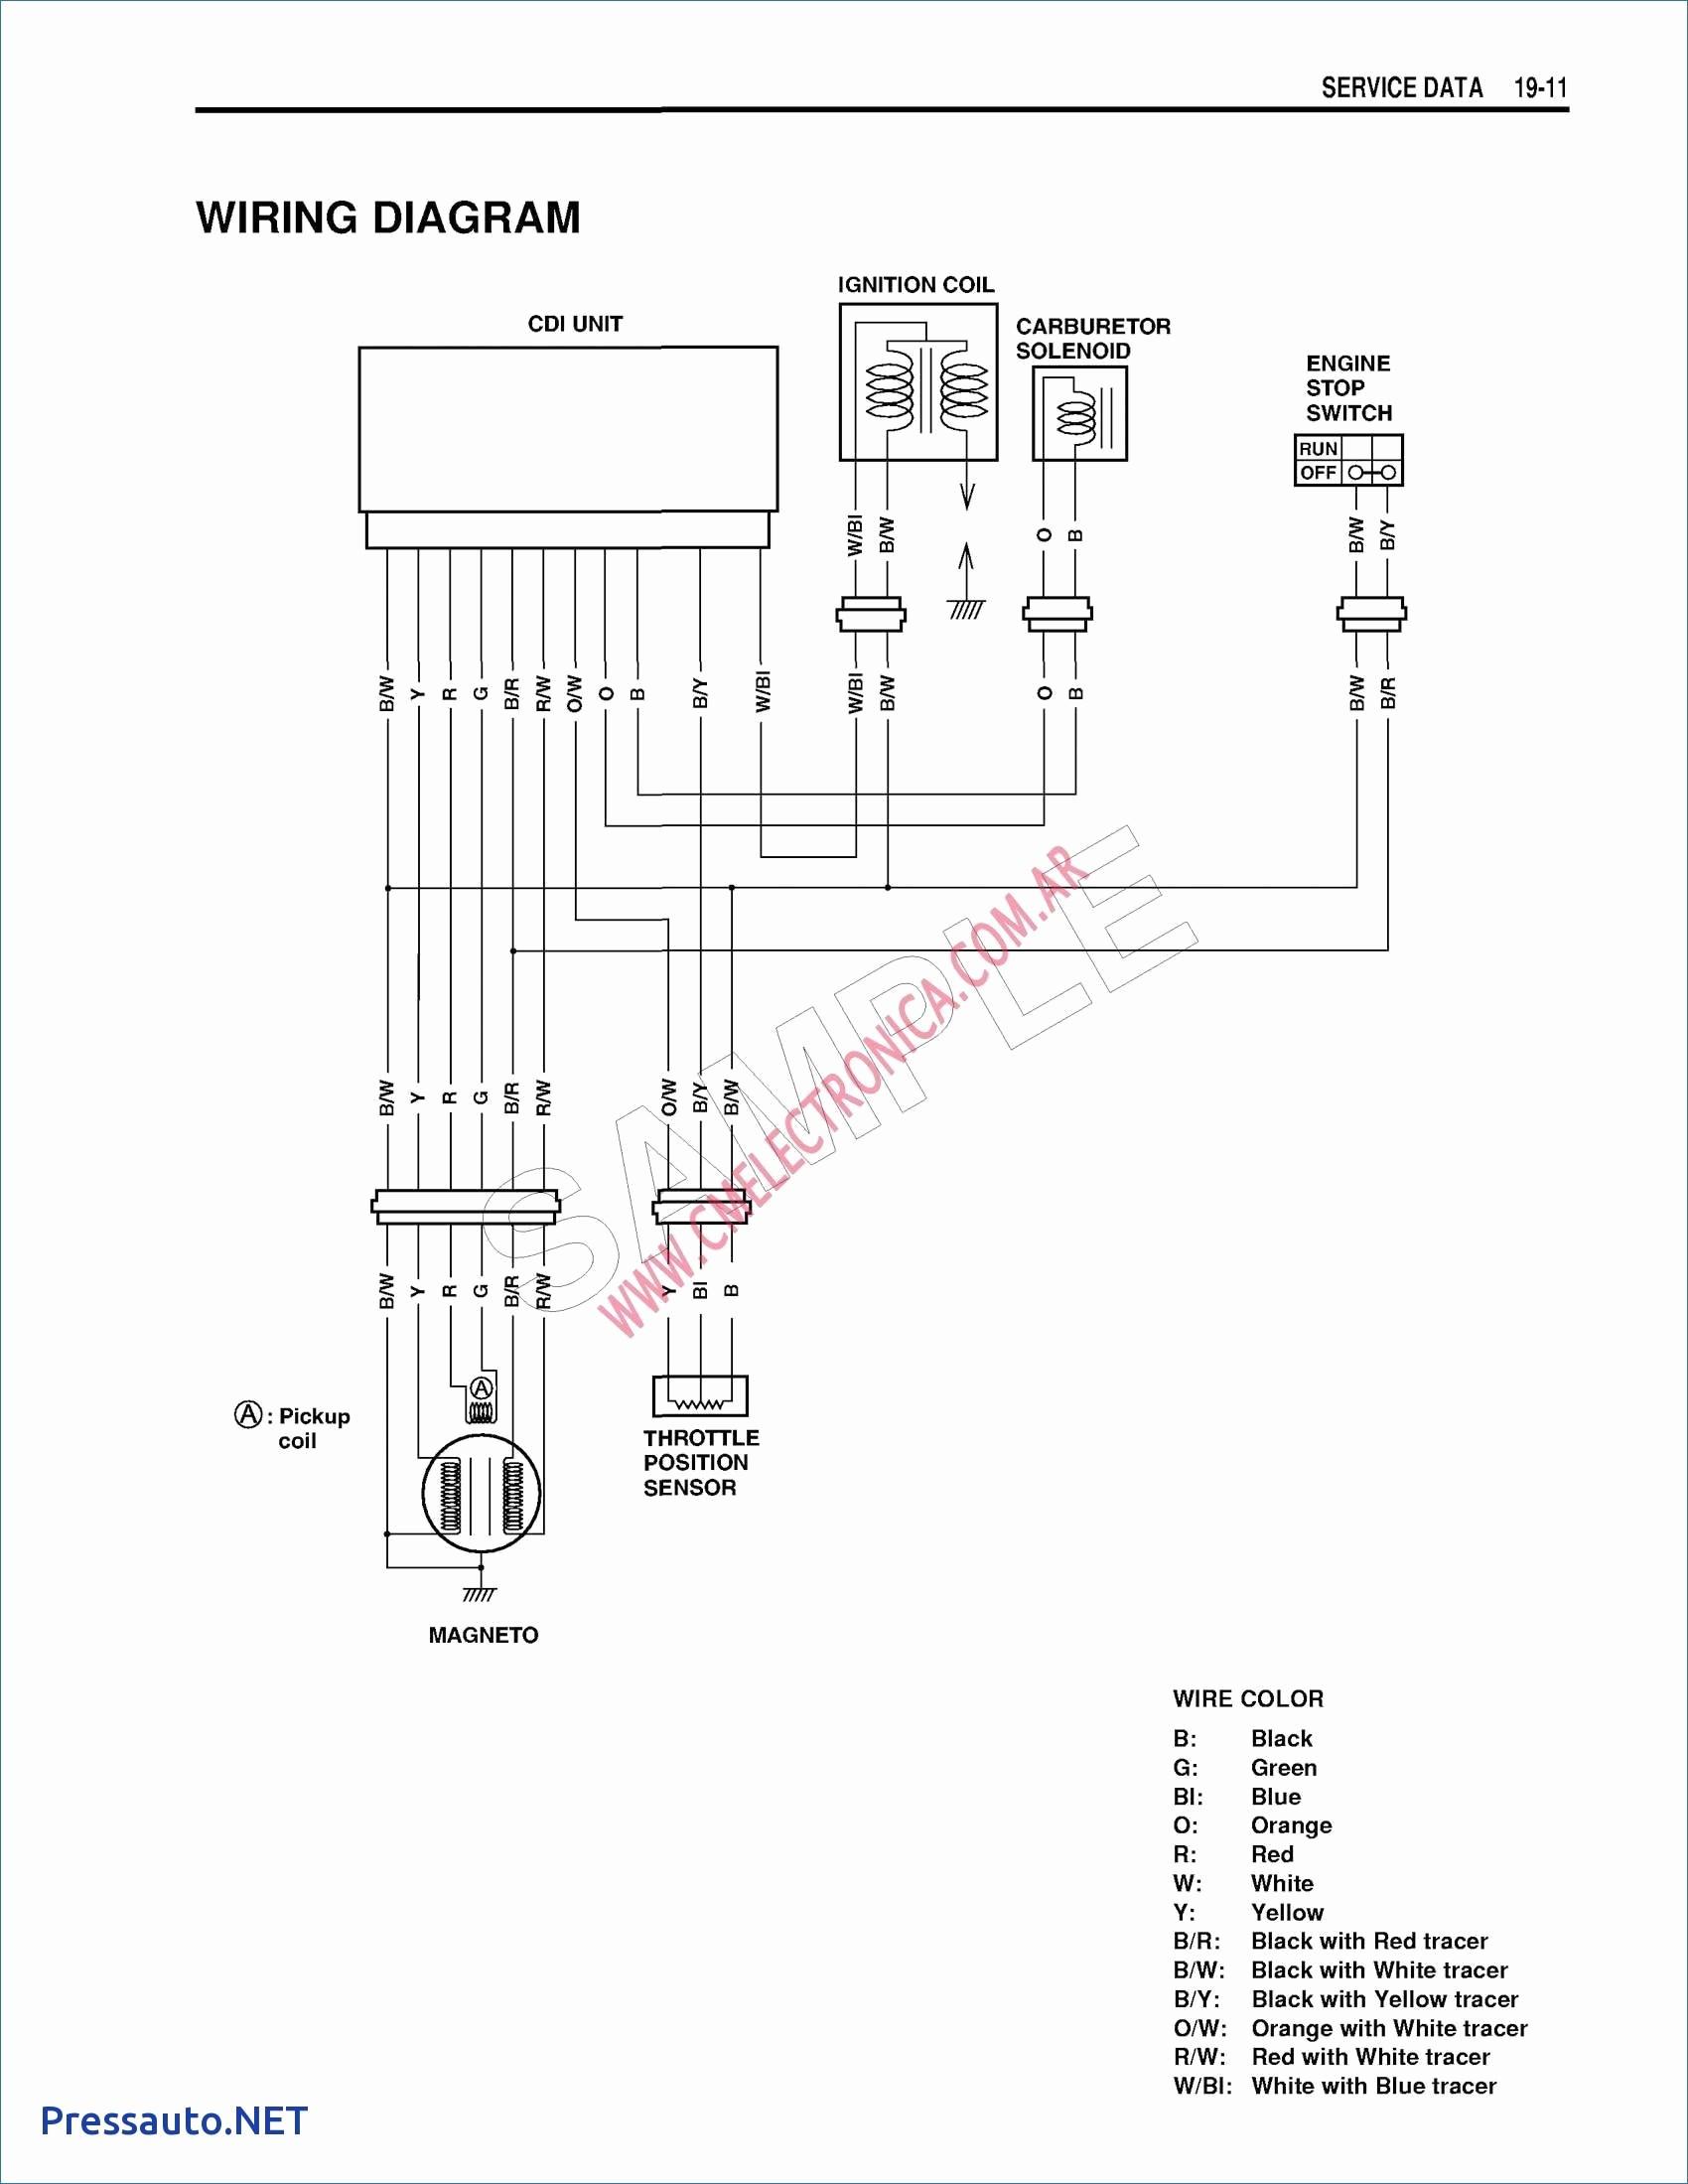 5 Pin Cdi Wiring Diagram New Box Beautiful 6 7 Natebird 5 Pin Cdi Wiring